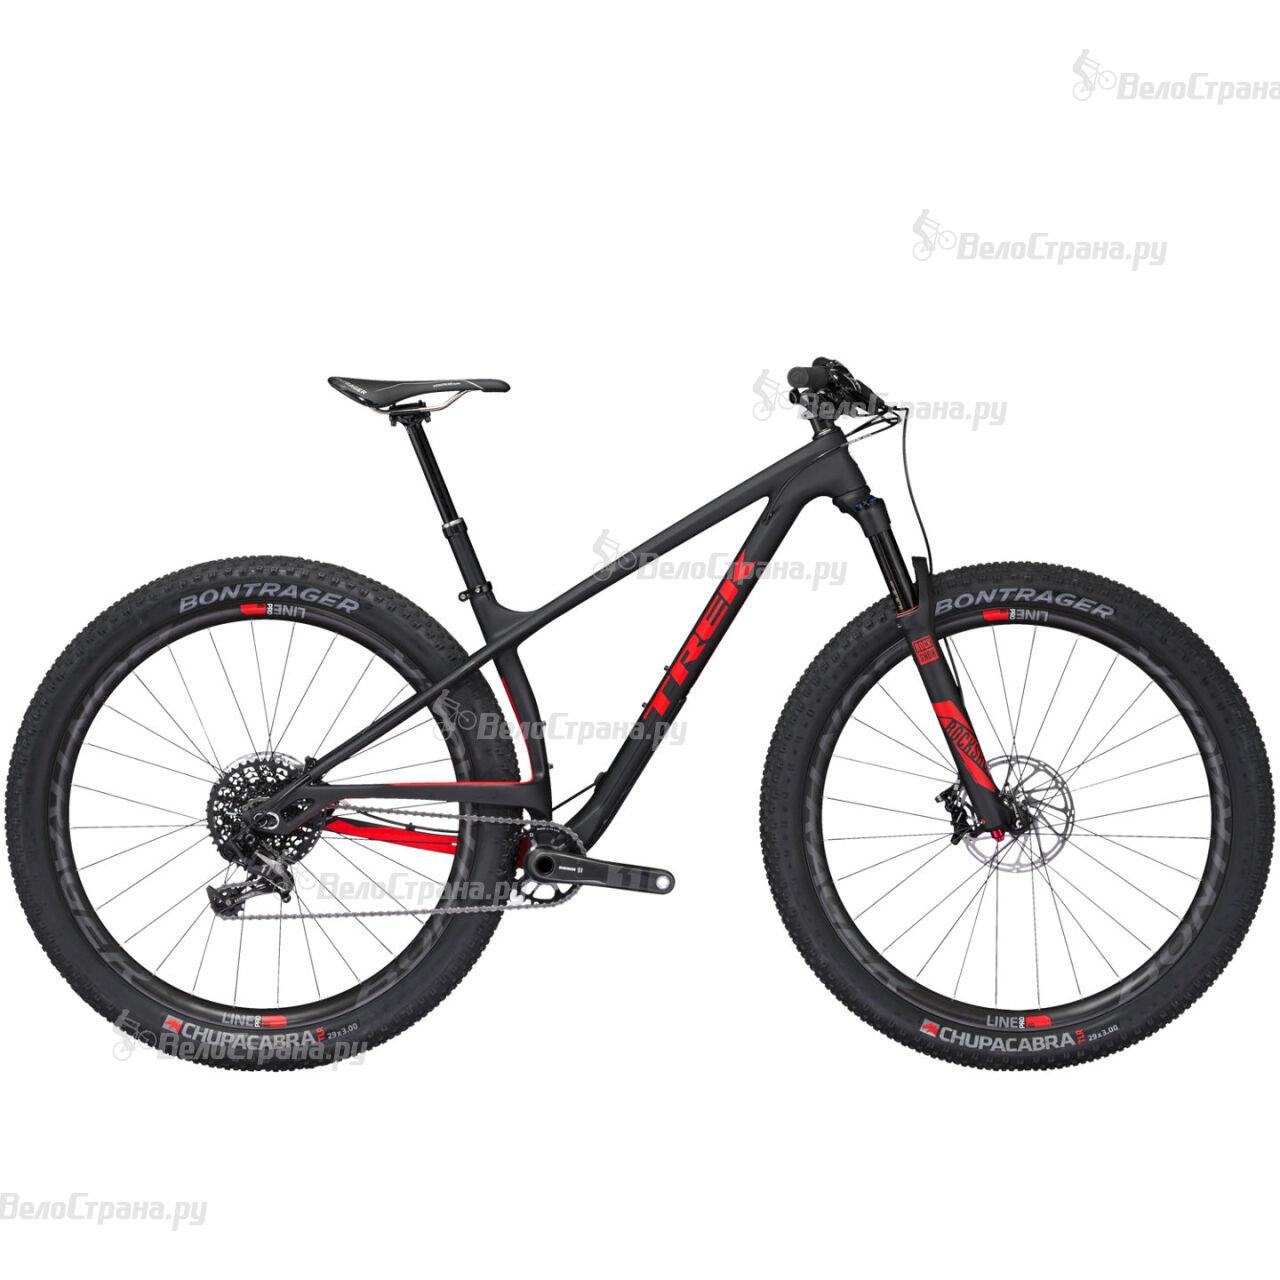 Велосипед Trek Stache 9.8 (2017) trek stache 7 2014